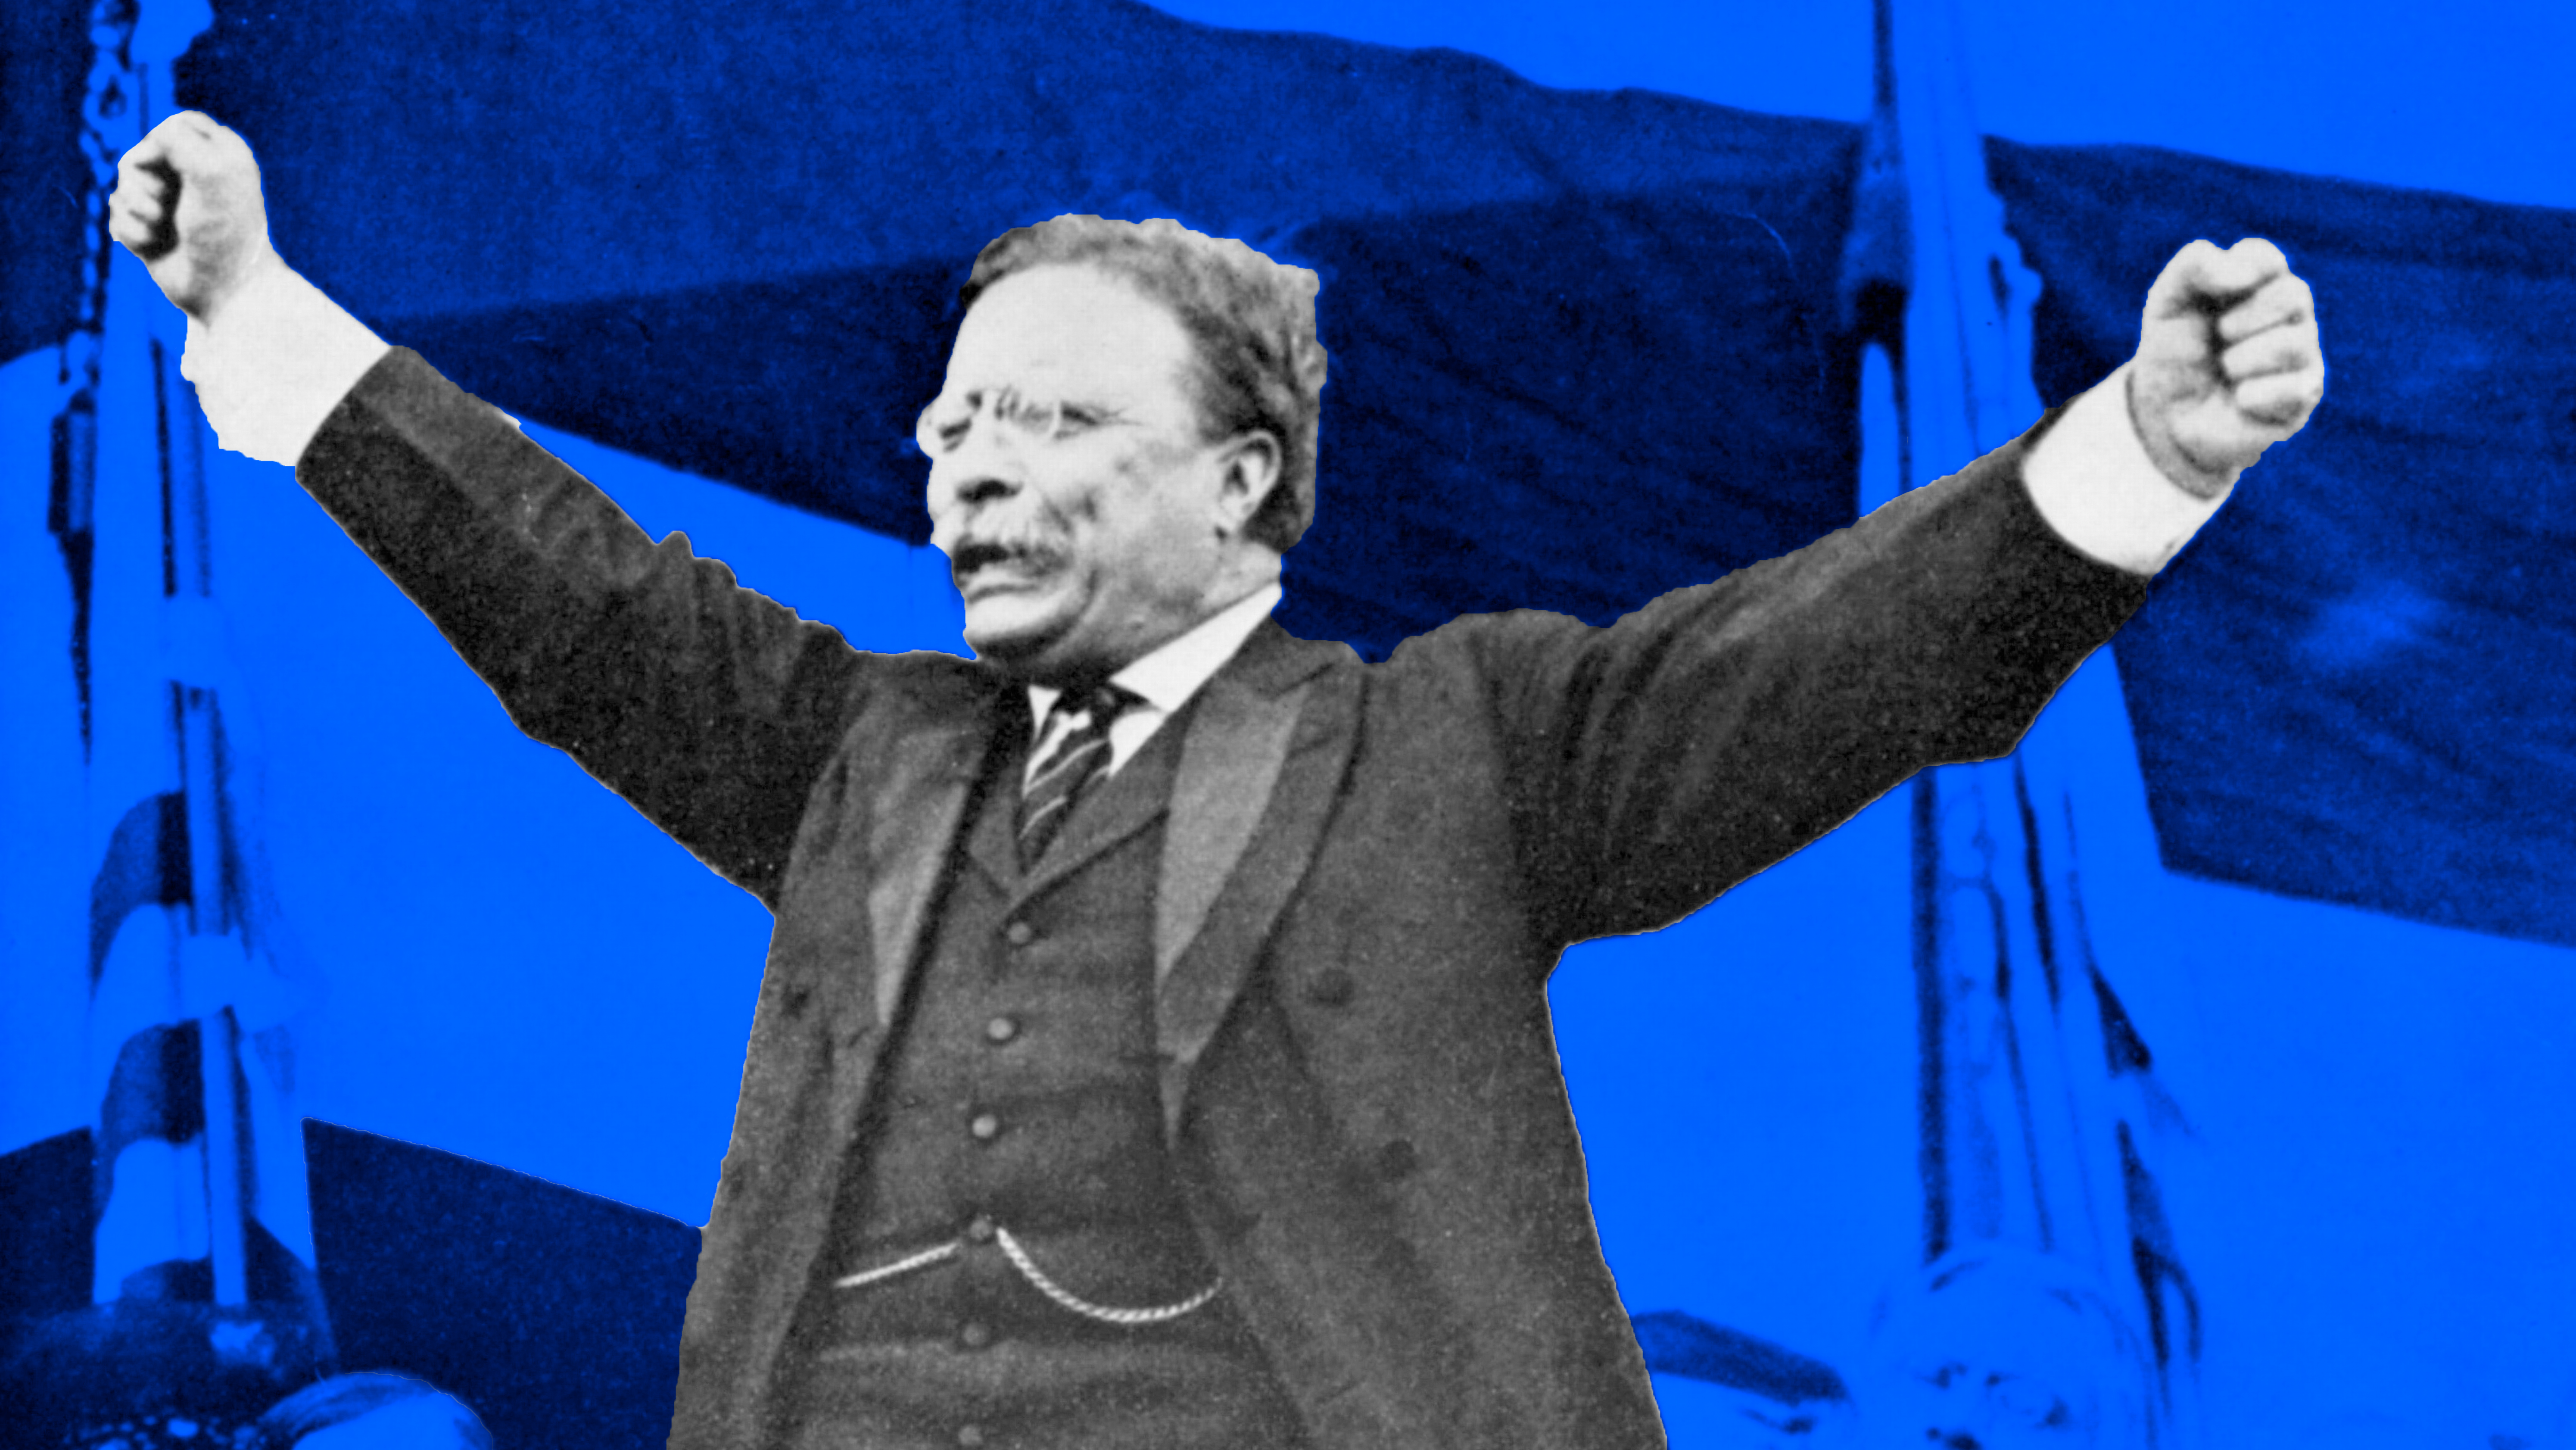 Theodore Roosevelt makes a speech as president.